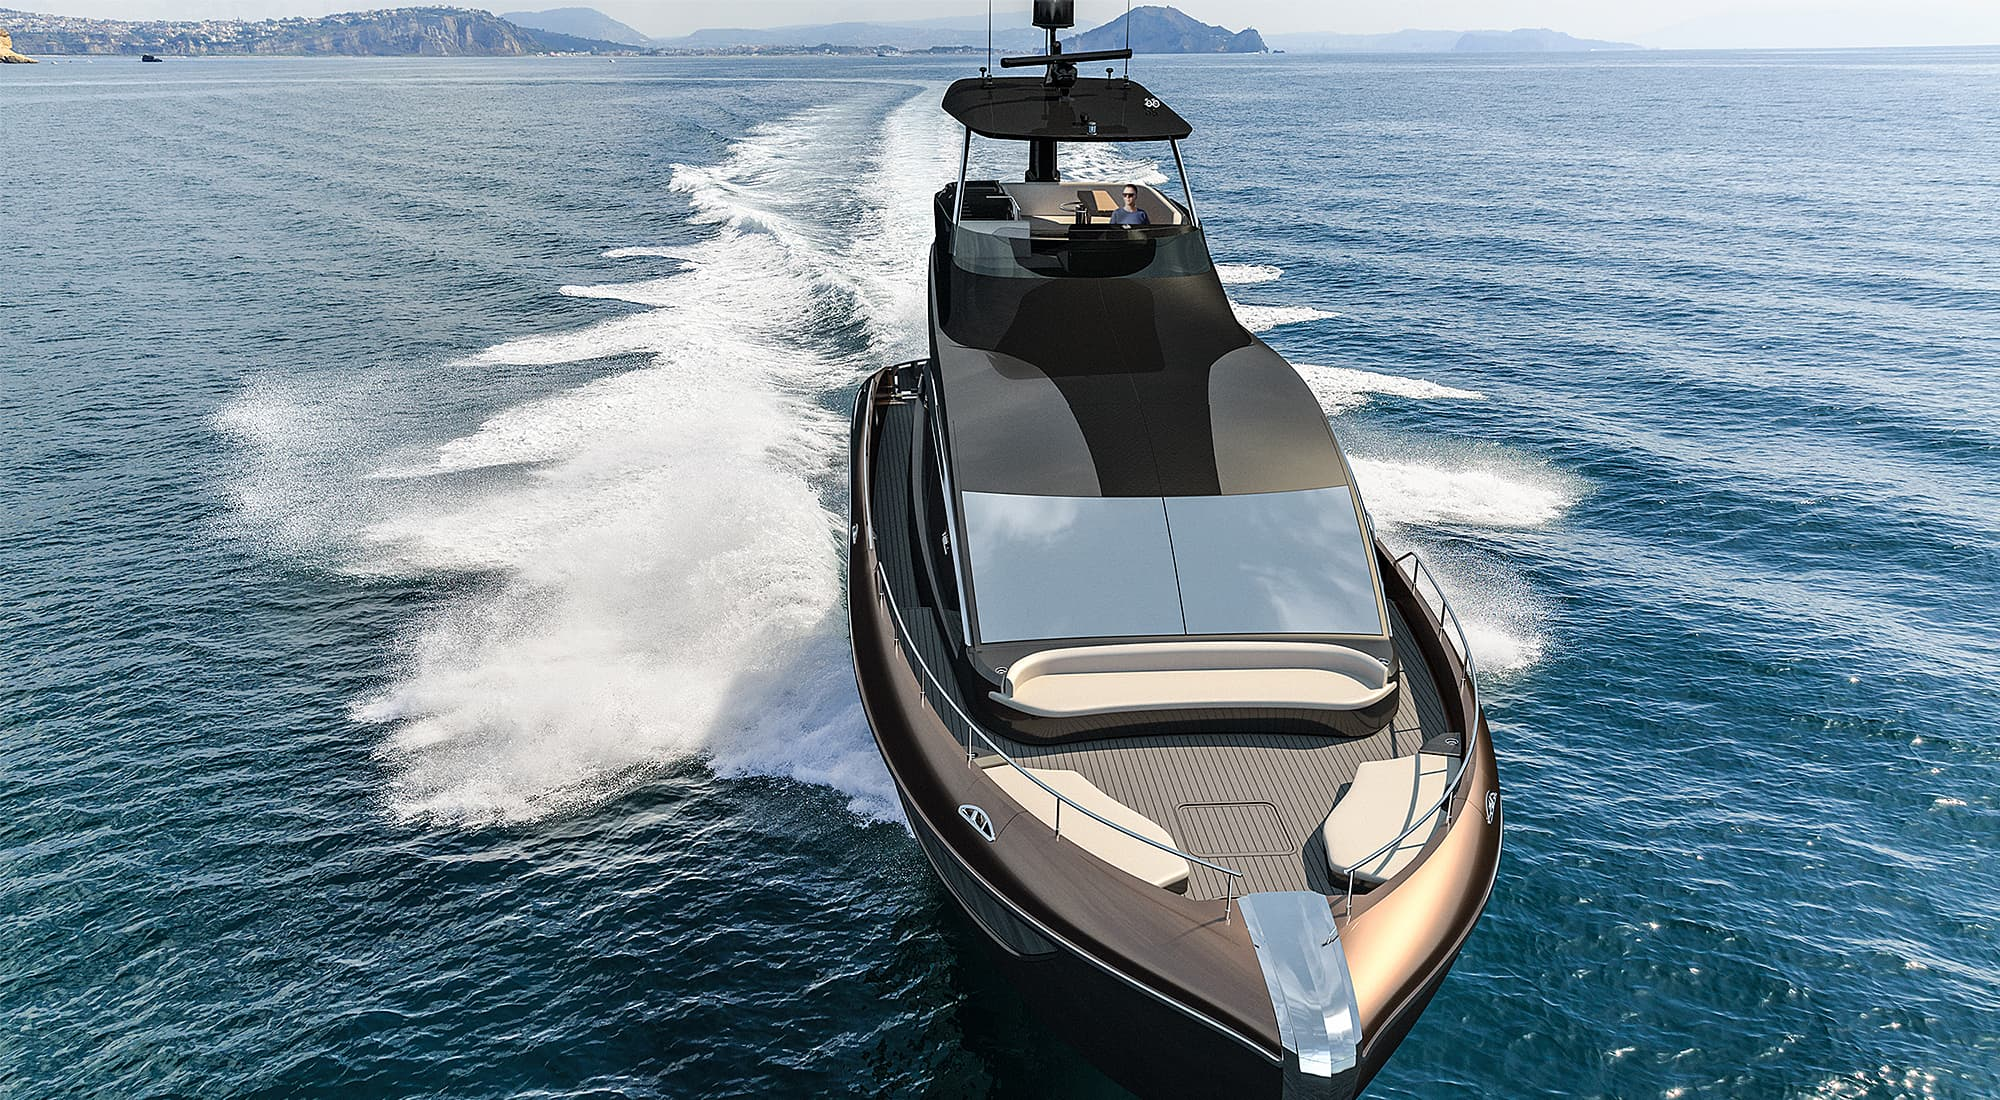 10-Lexus-yacht-2000x1100-run2_M75.jpg